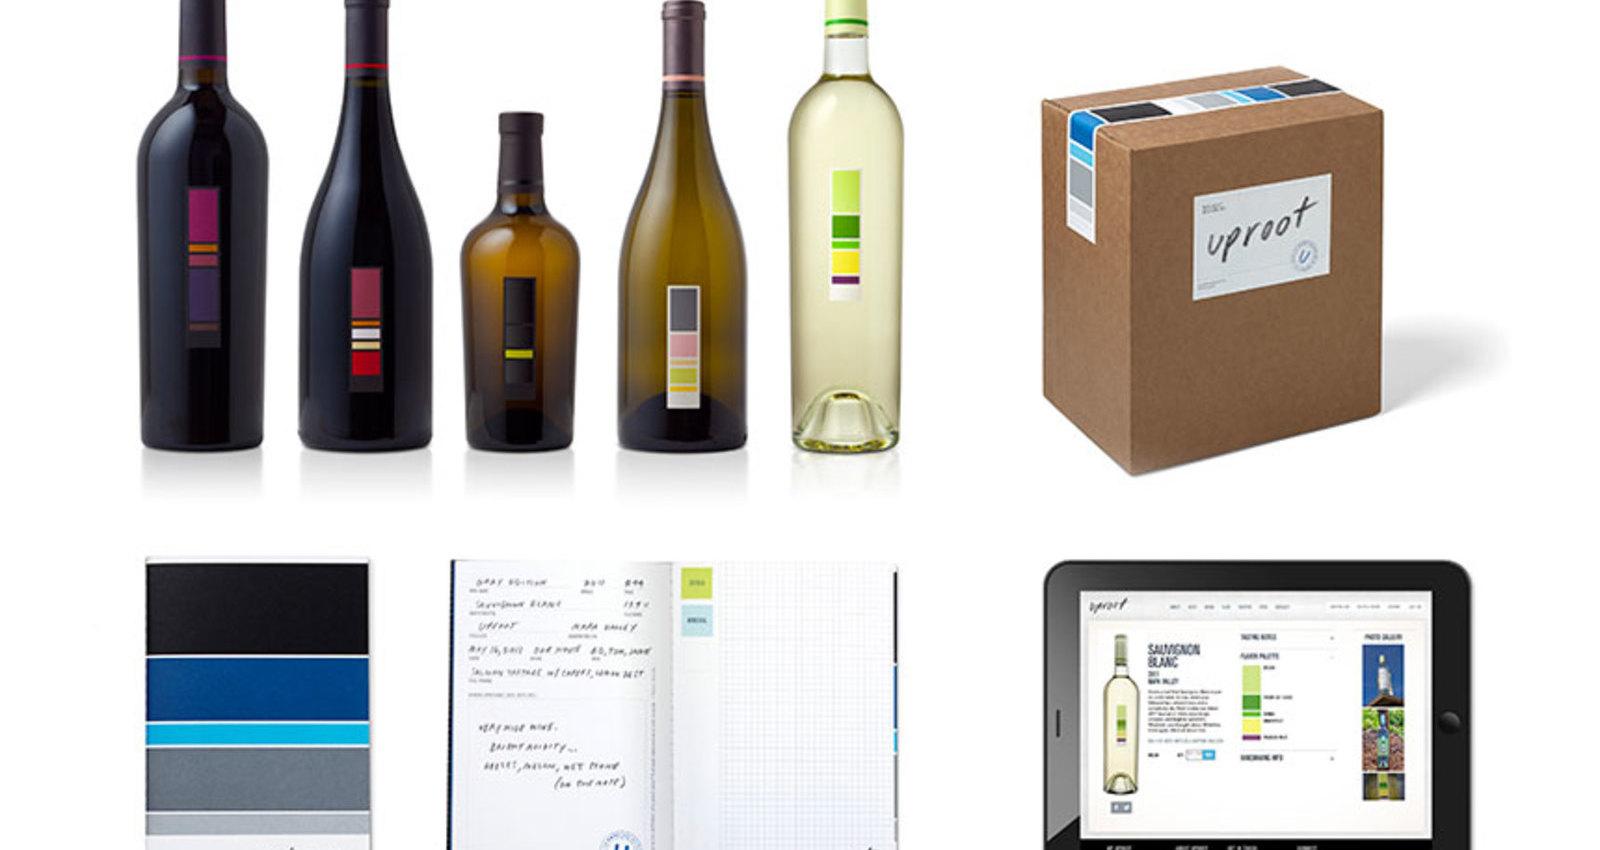 Uproot Wine Packaging